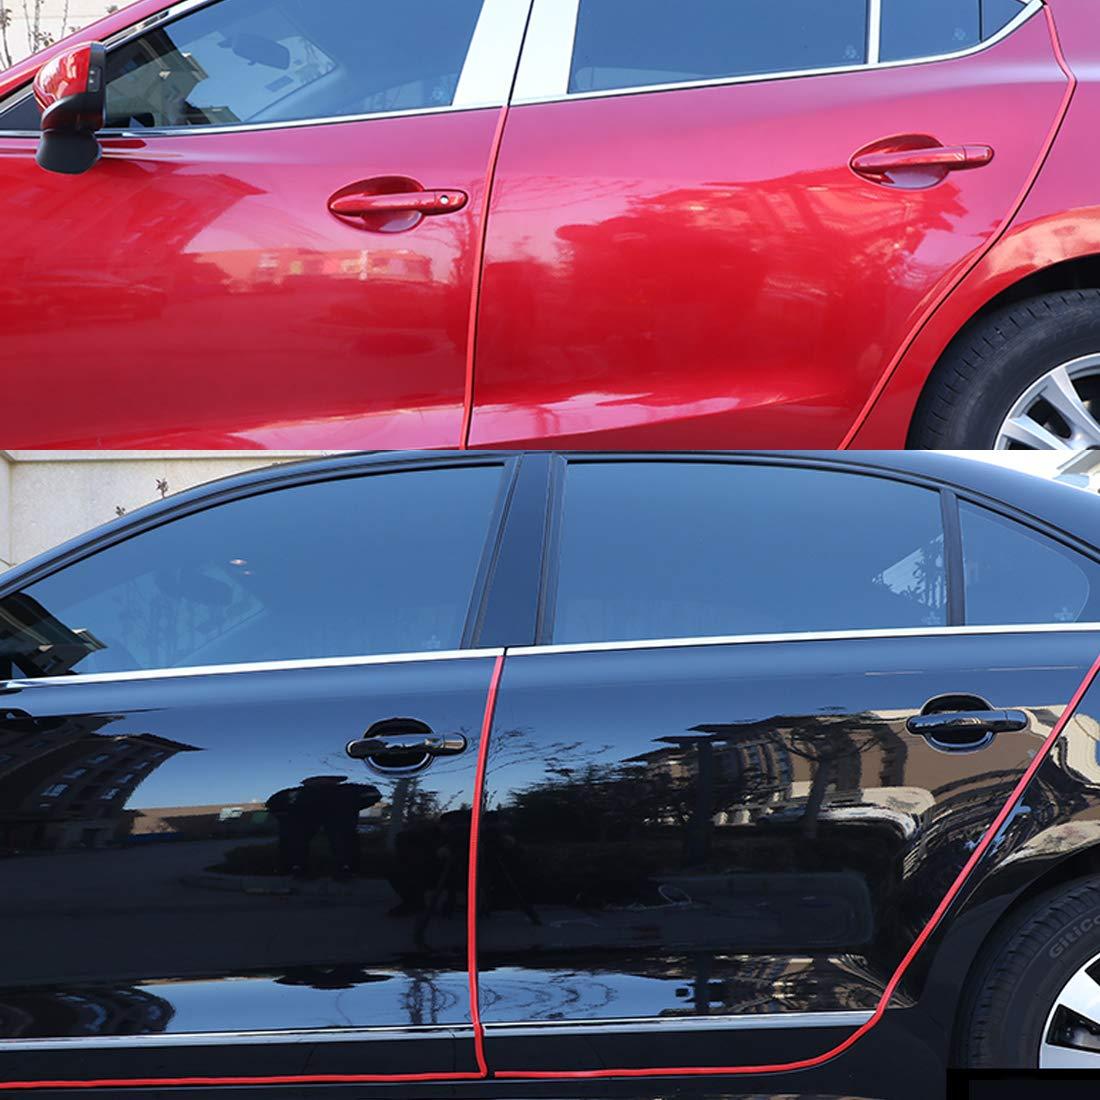 SEAMETAL Rubber Car Door Guards Protector Edge 32ft Red